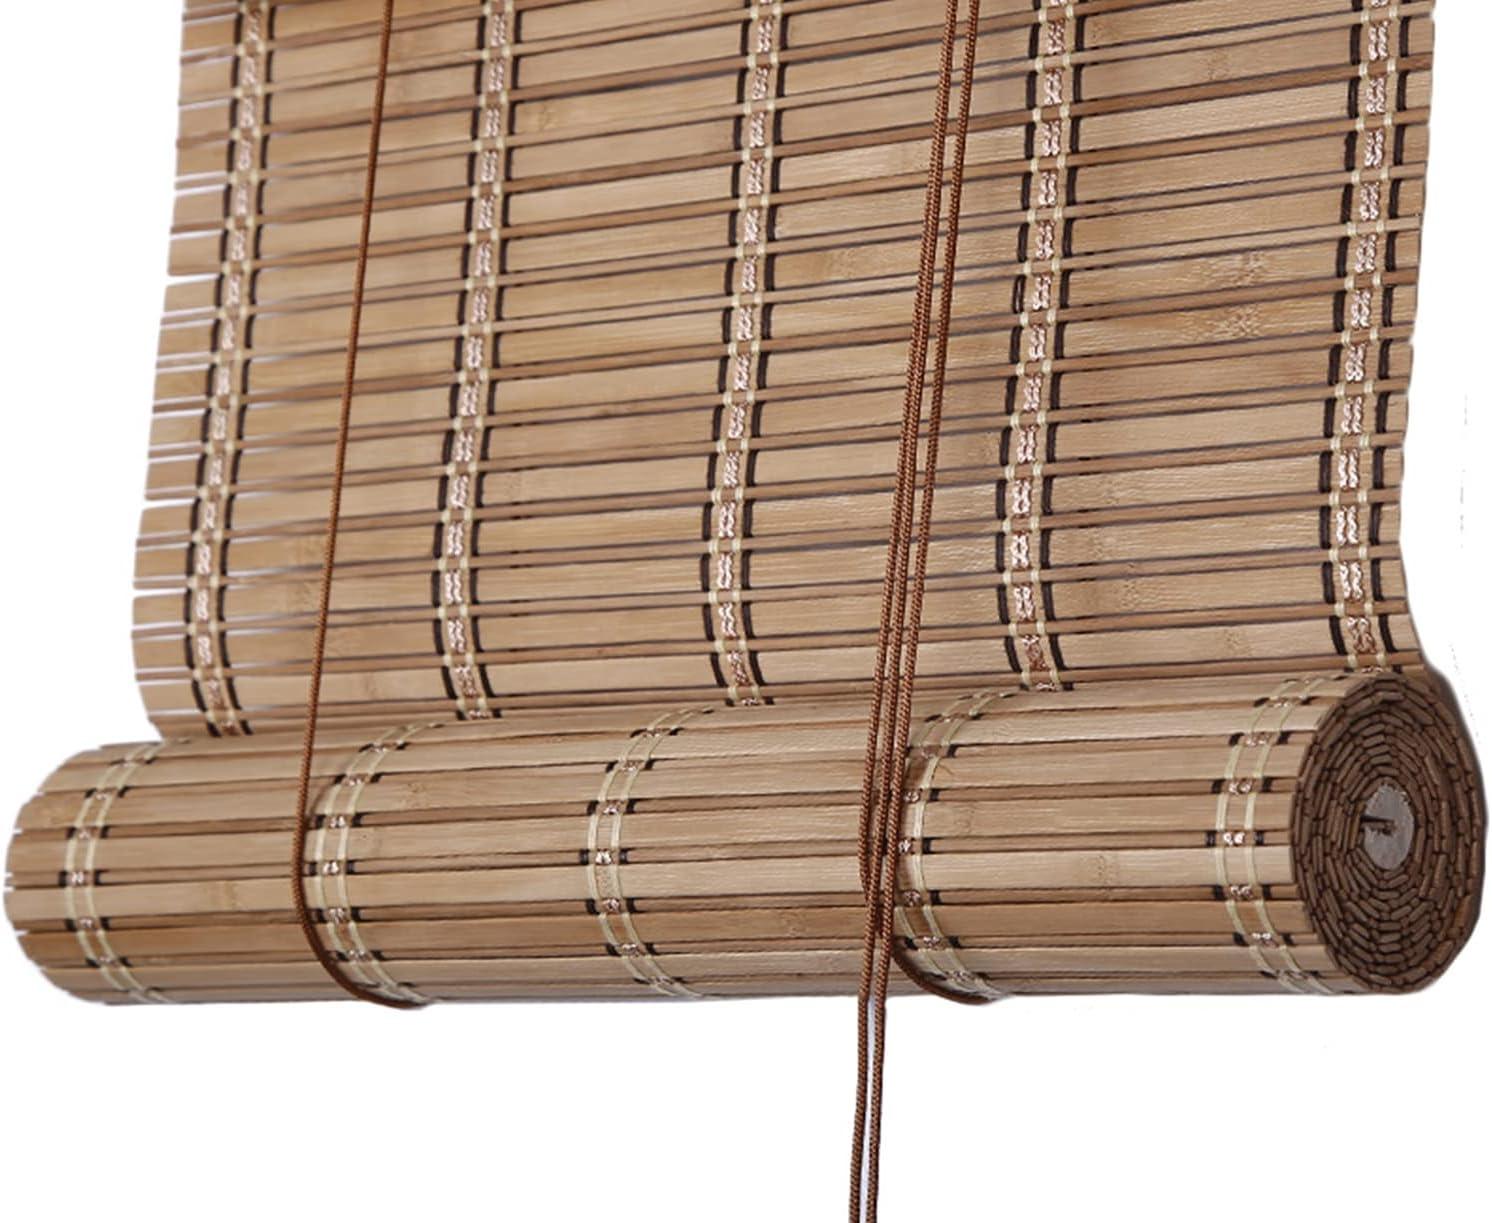 gift Superior Roller Blinds Outdoor Bamboo Shades Wide Shutter Window